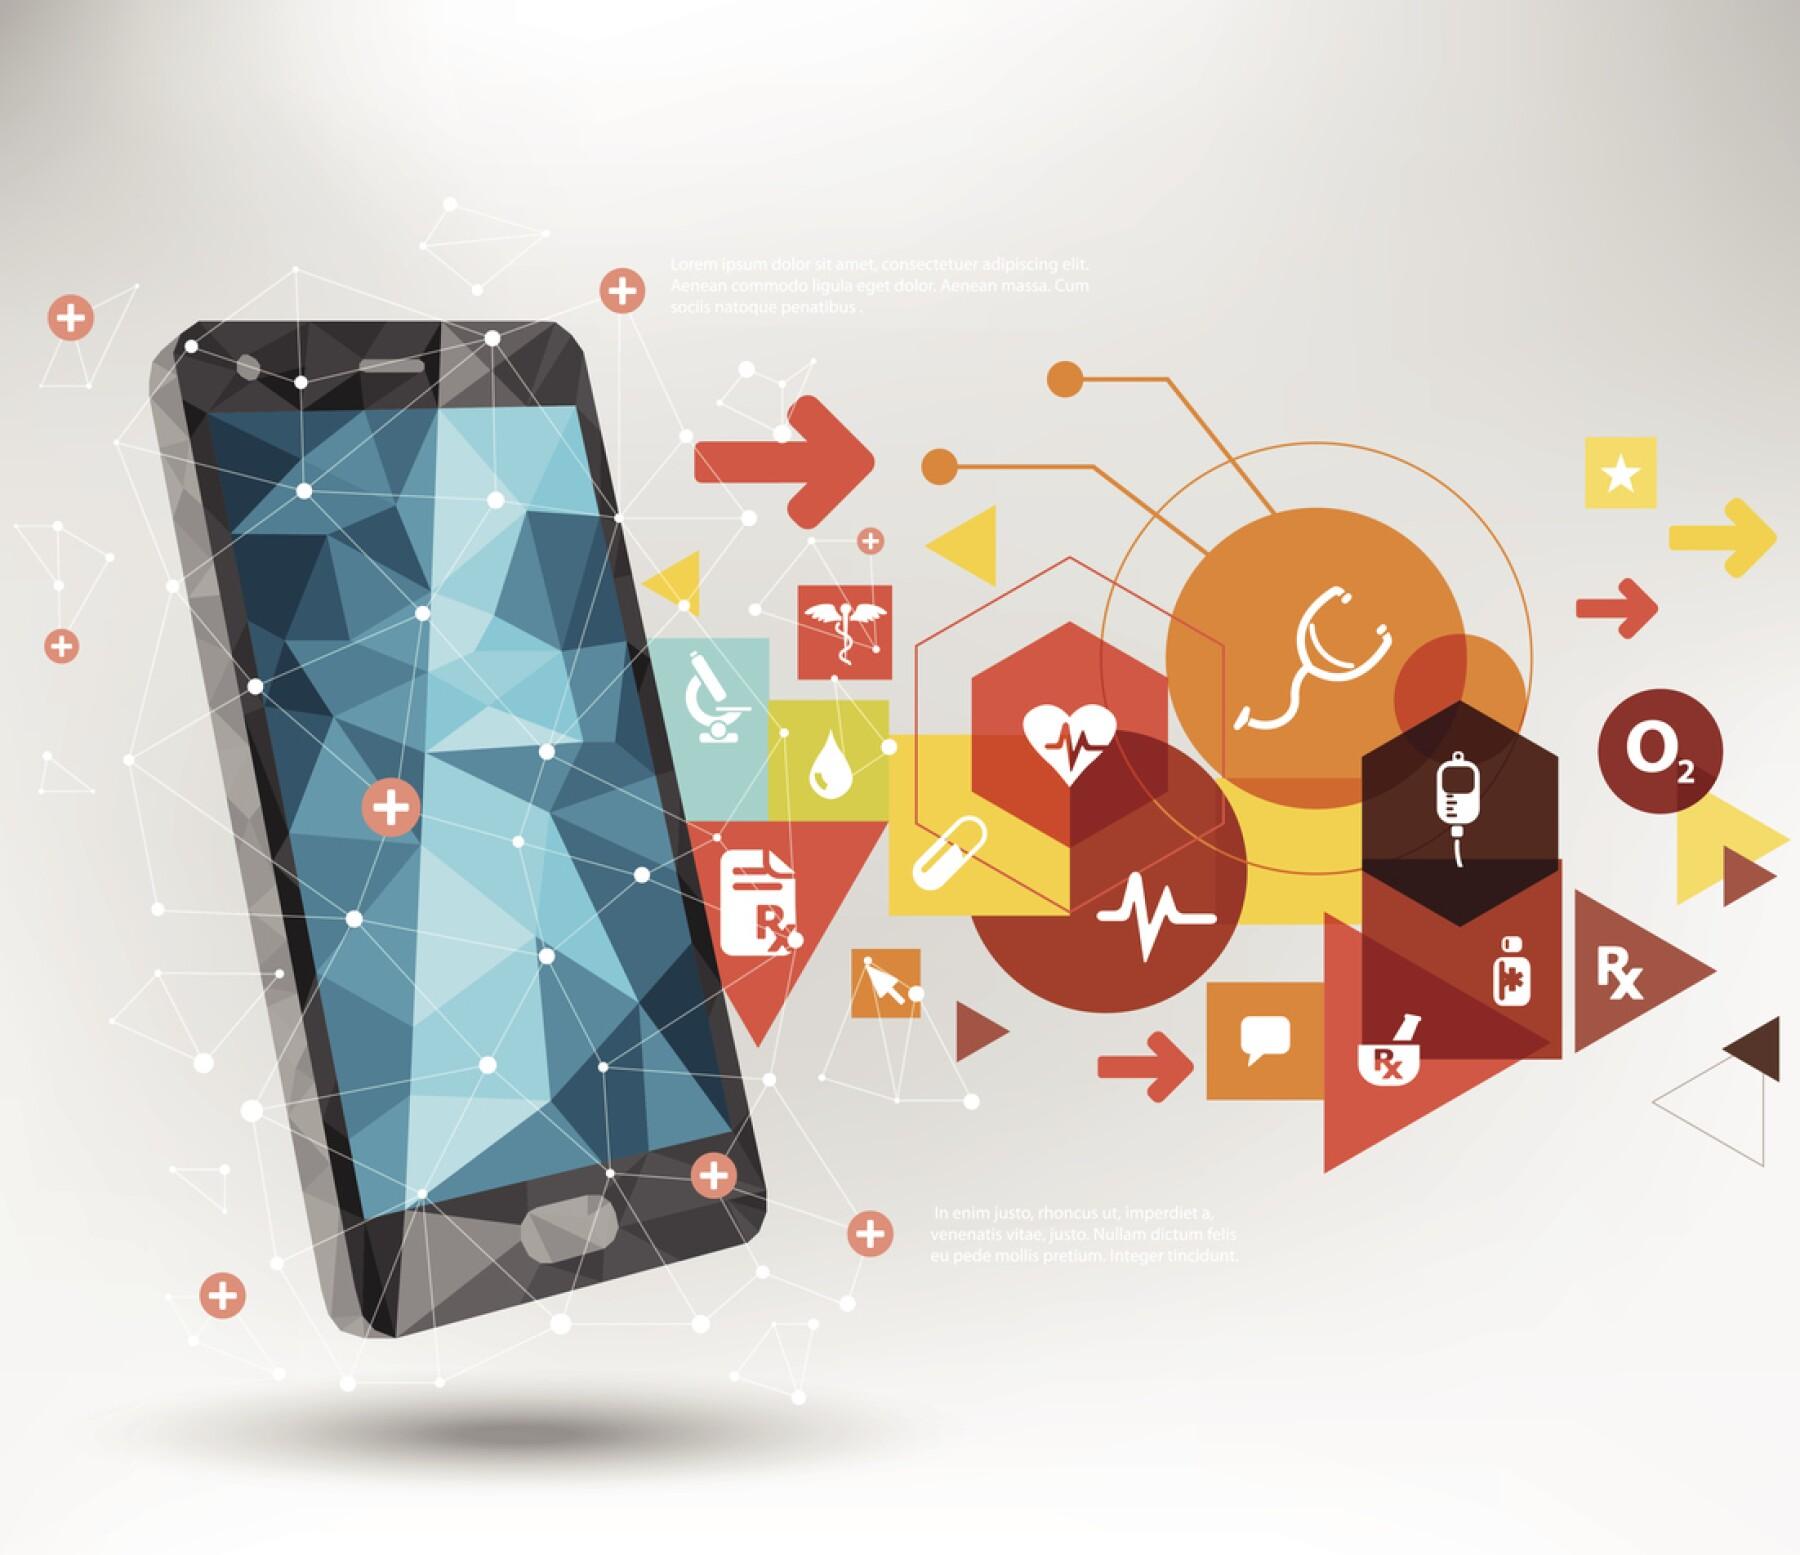 Teléfono celular_laboratorio inteligente contra enfermedades